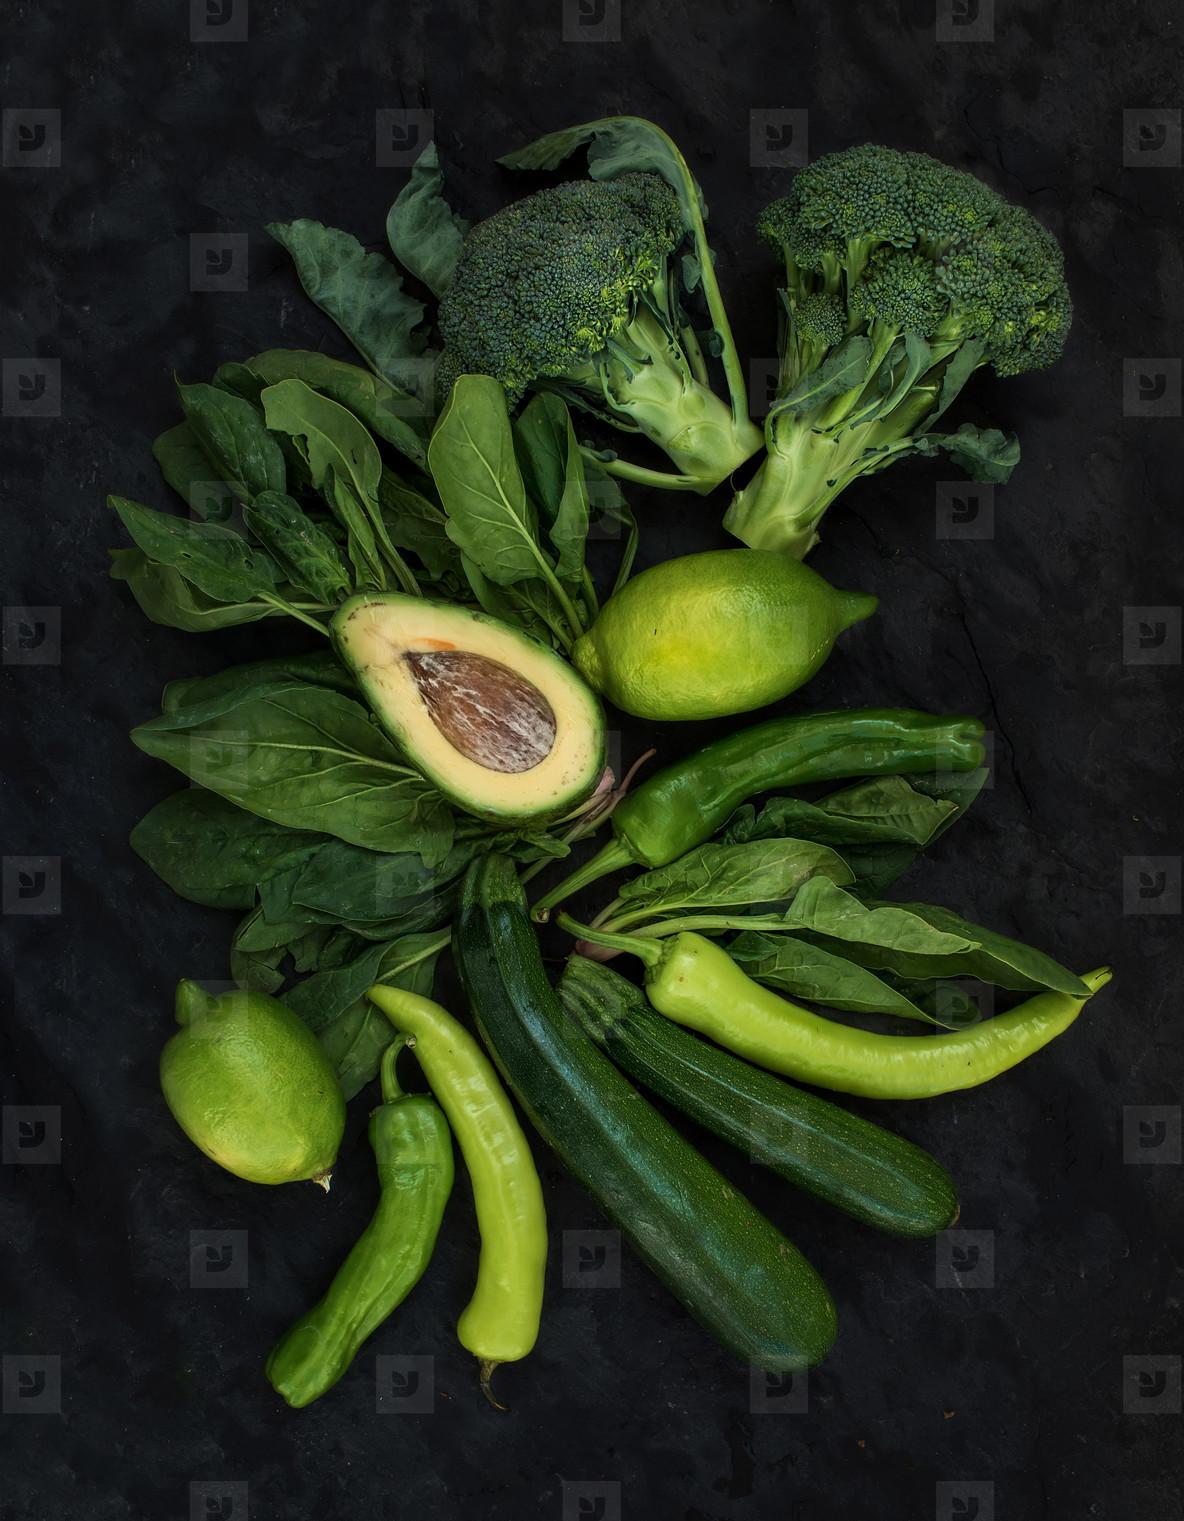 Raw green vegetables set  Broccoli  avocado  pepper  spinach  zucchini  lime on dark stone background